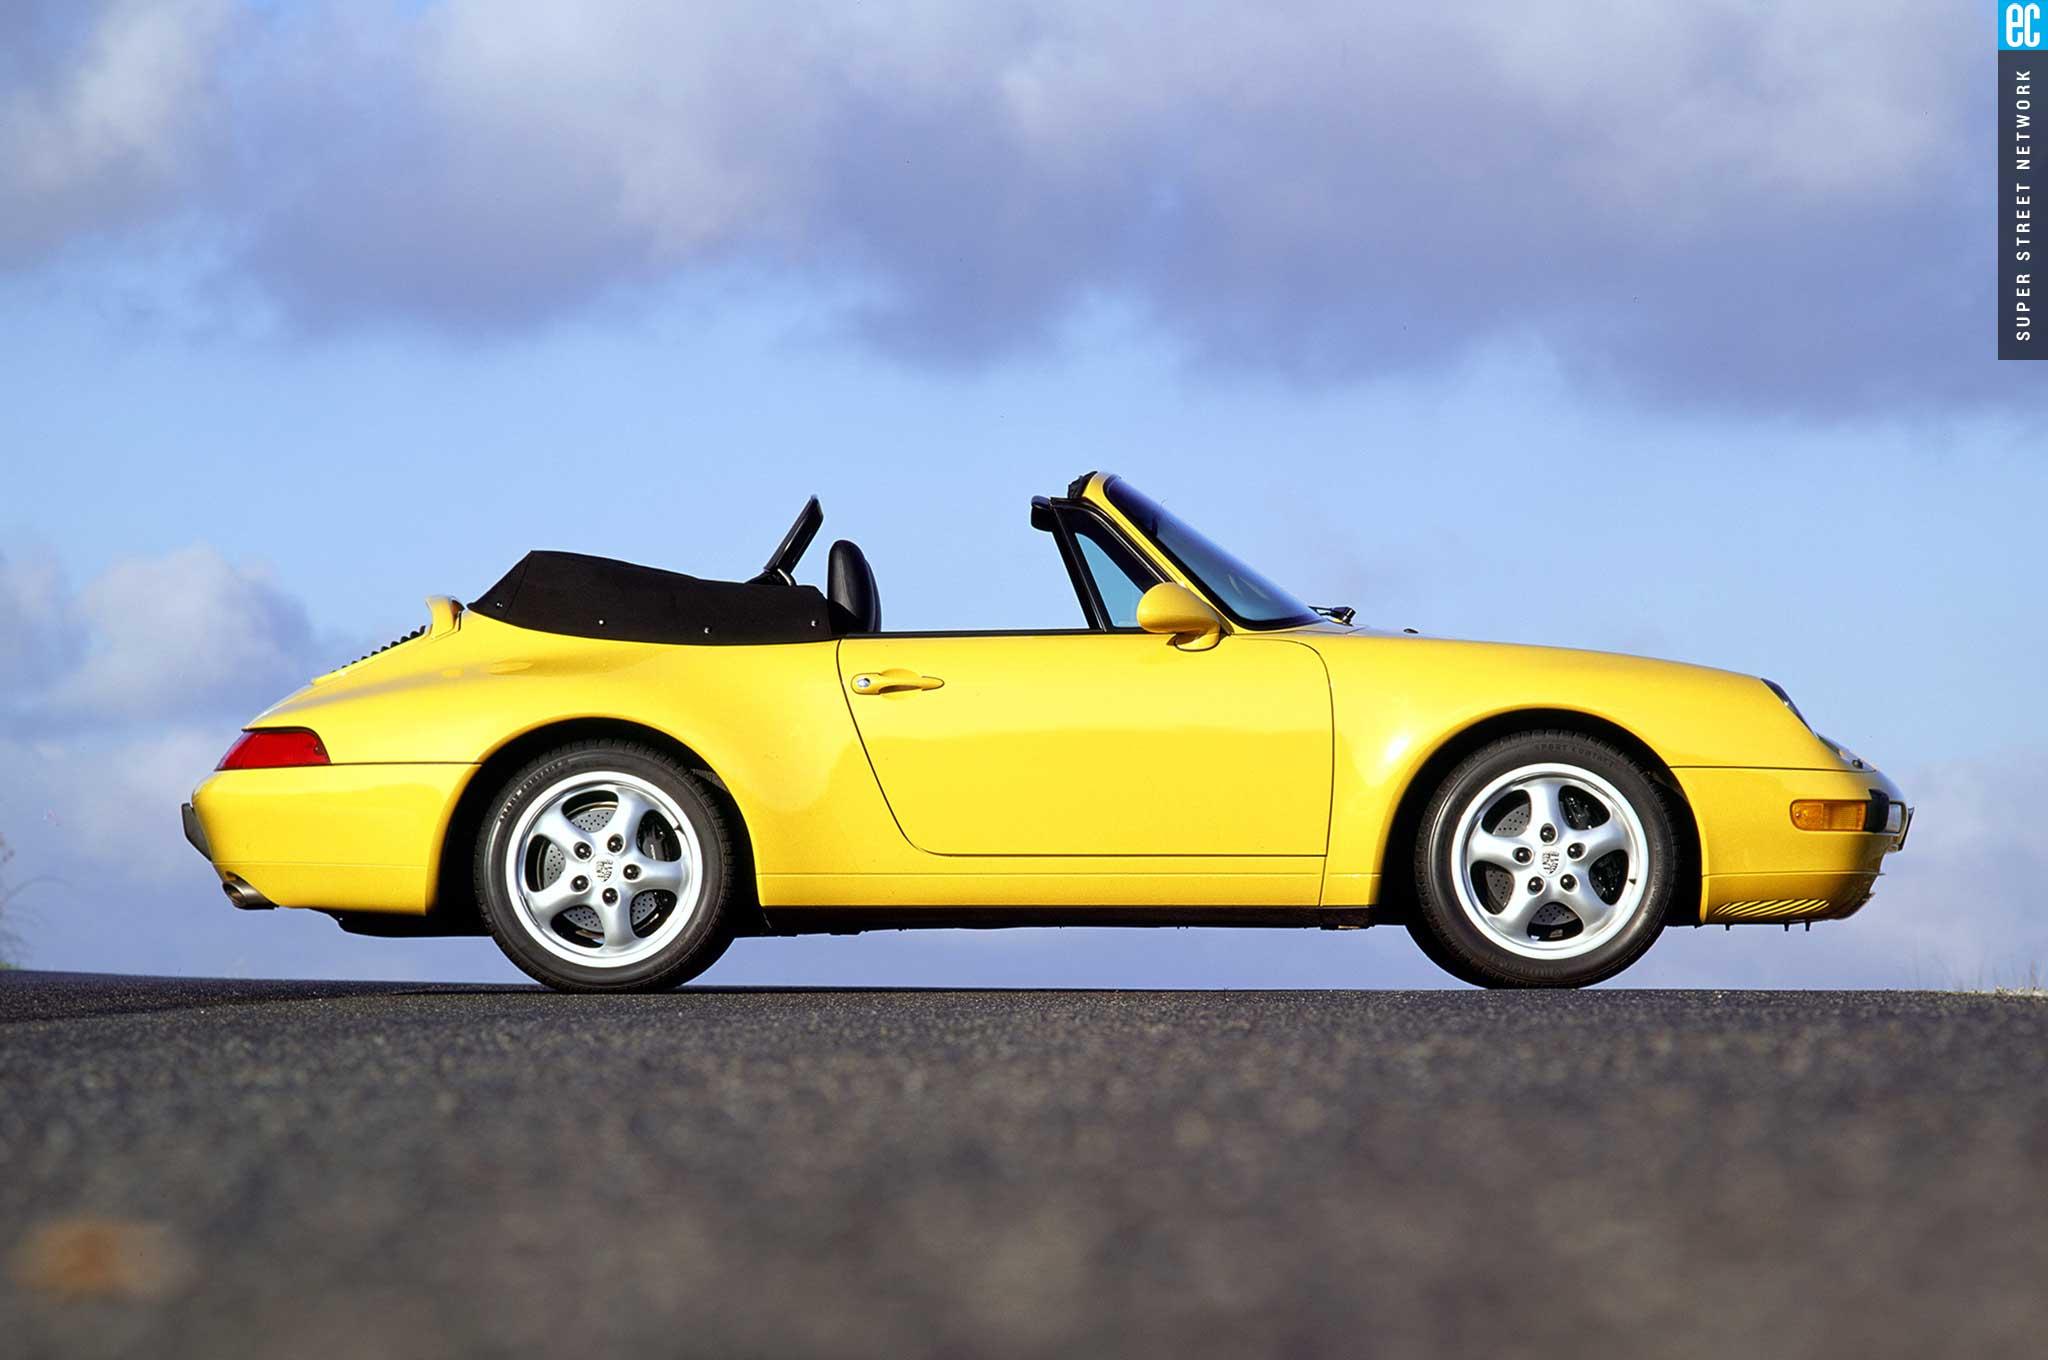 95 98 porsche 993 cabriolet passenger side profile